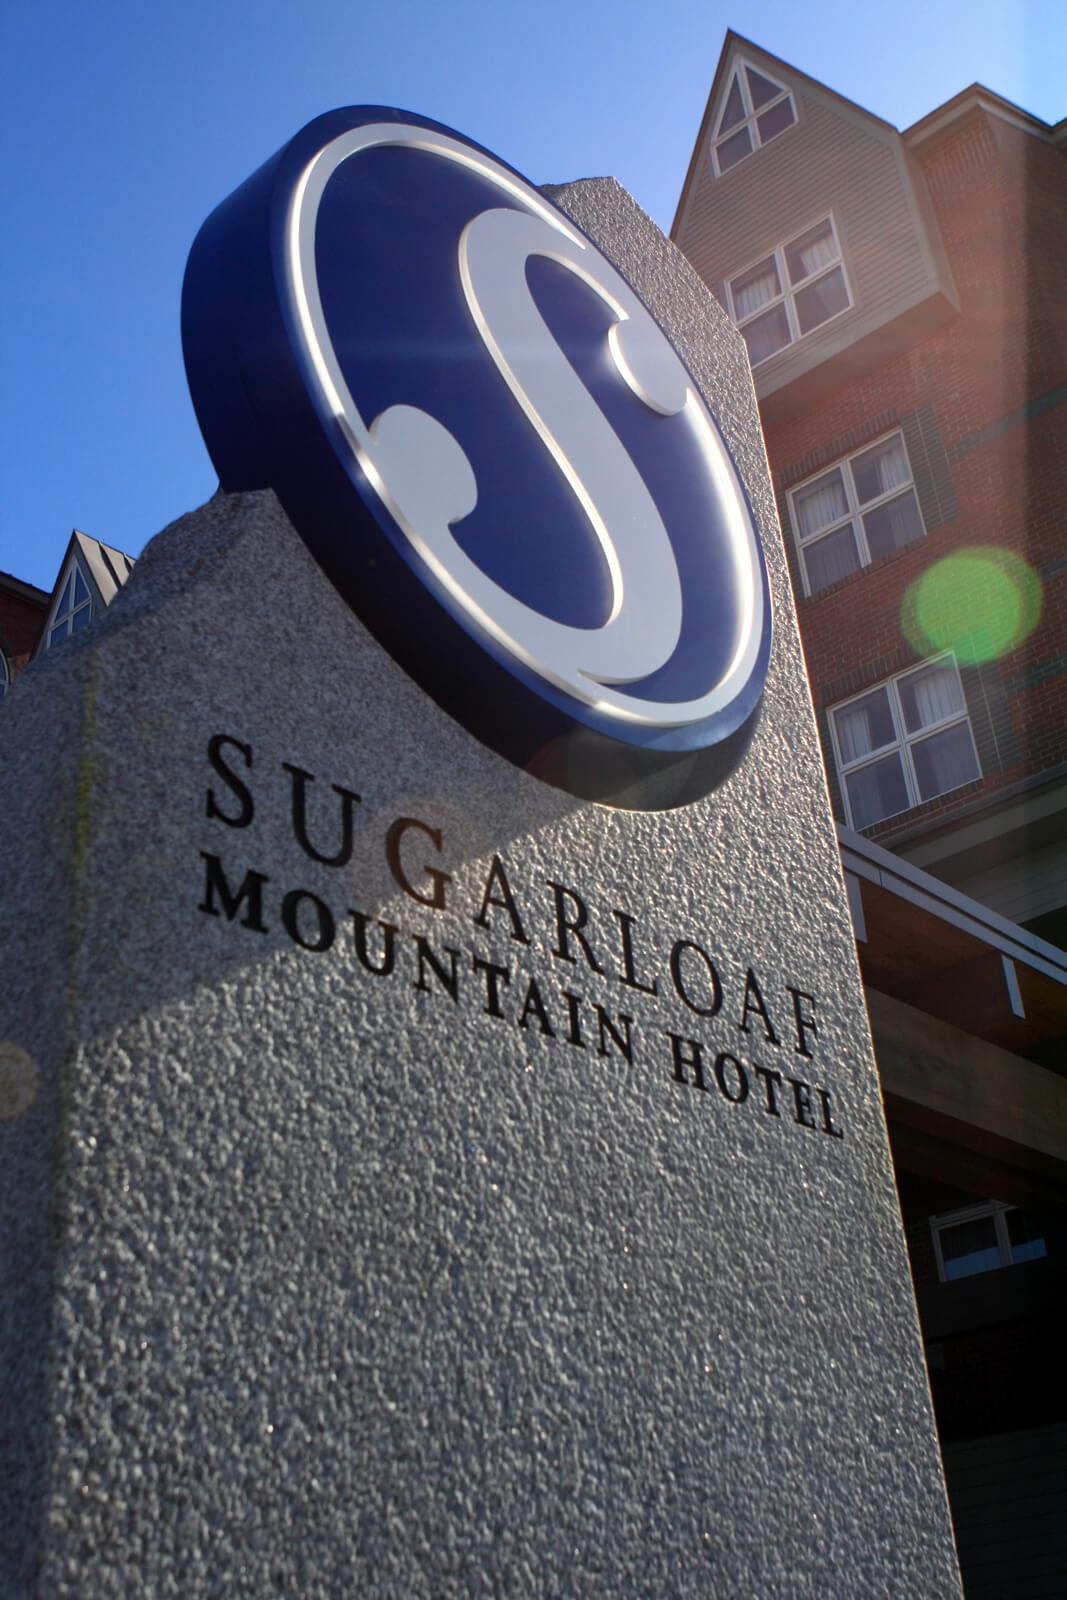 Sugarloaf Mountain Hotel granite sign